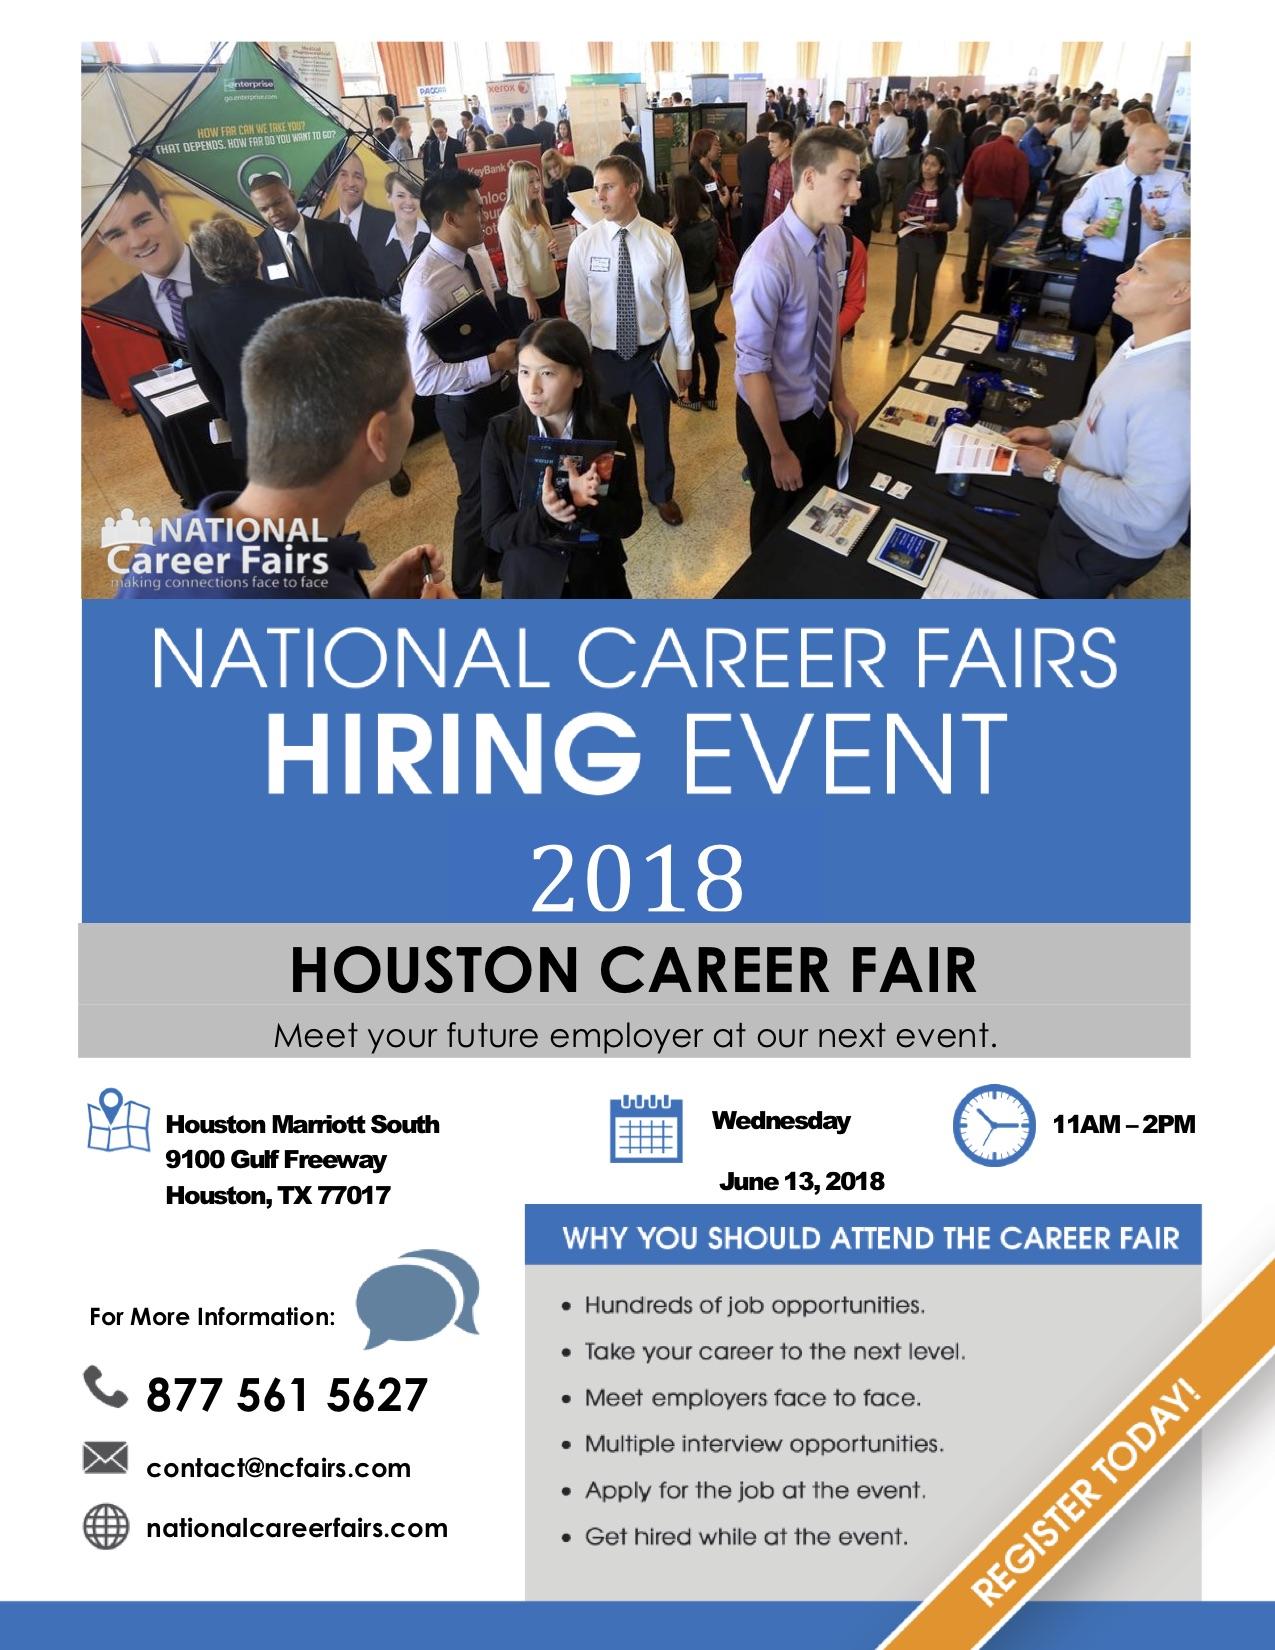 National Career Fairs Hiring Event 2018